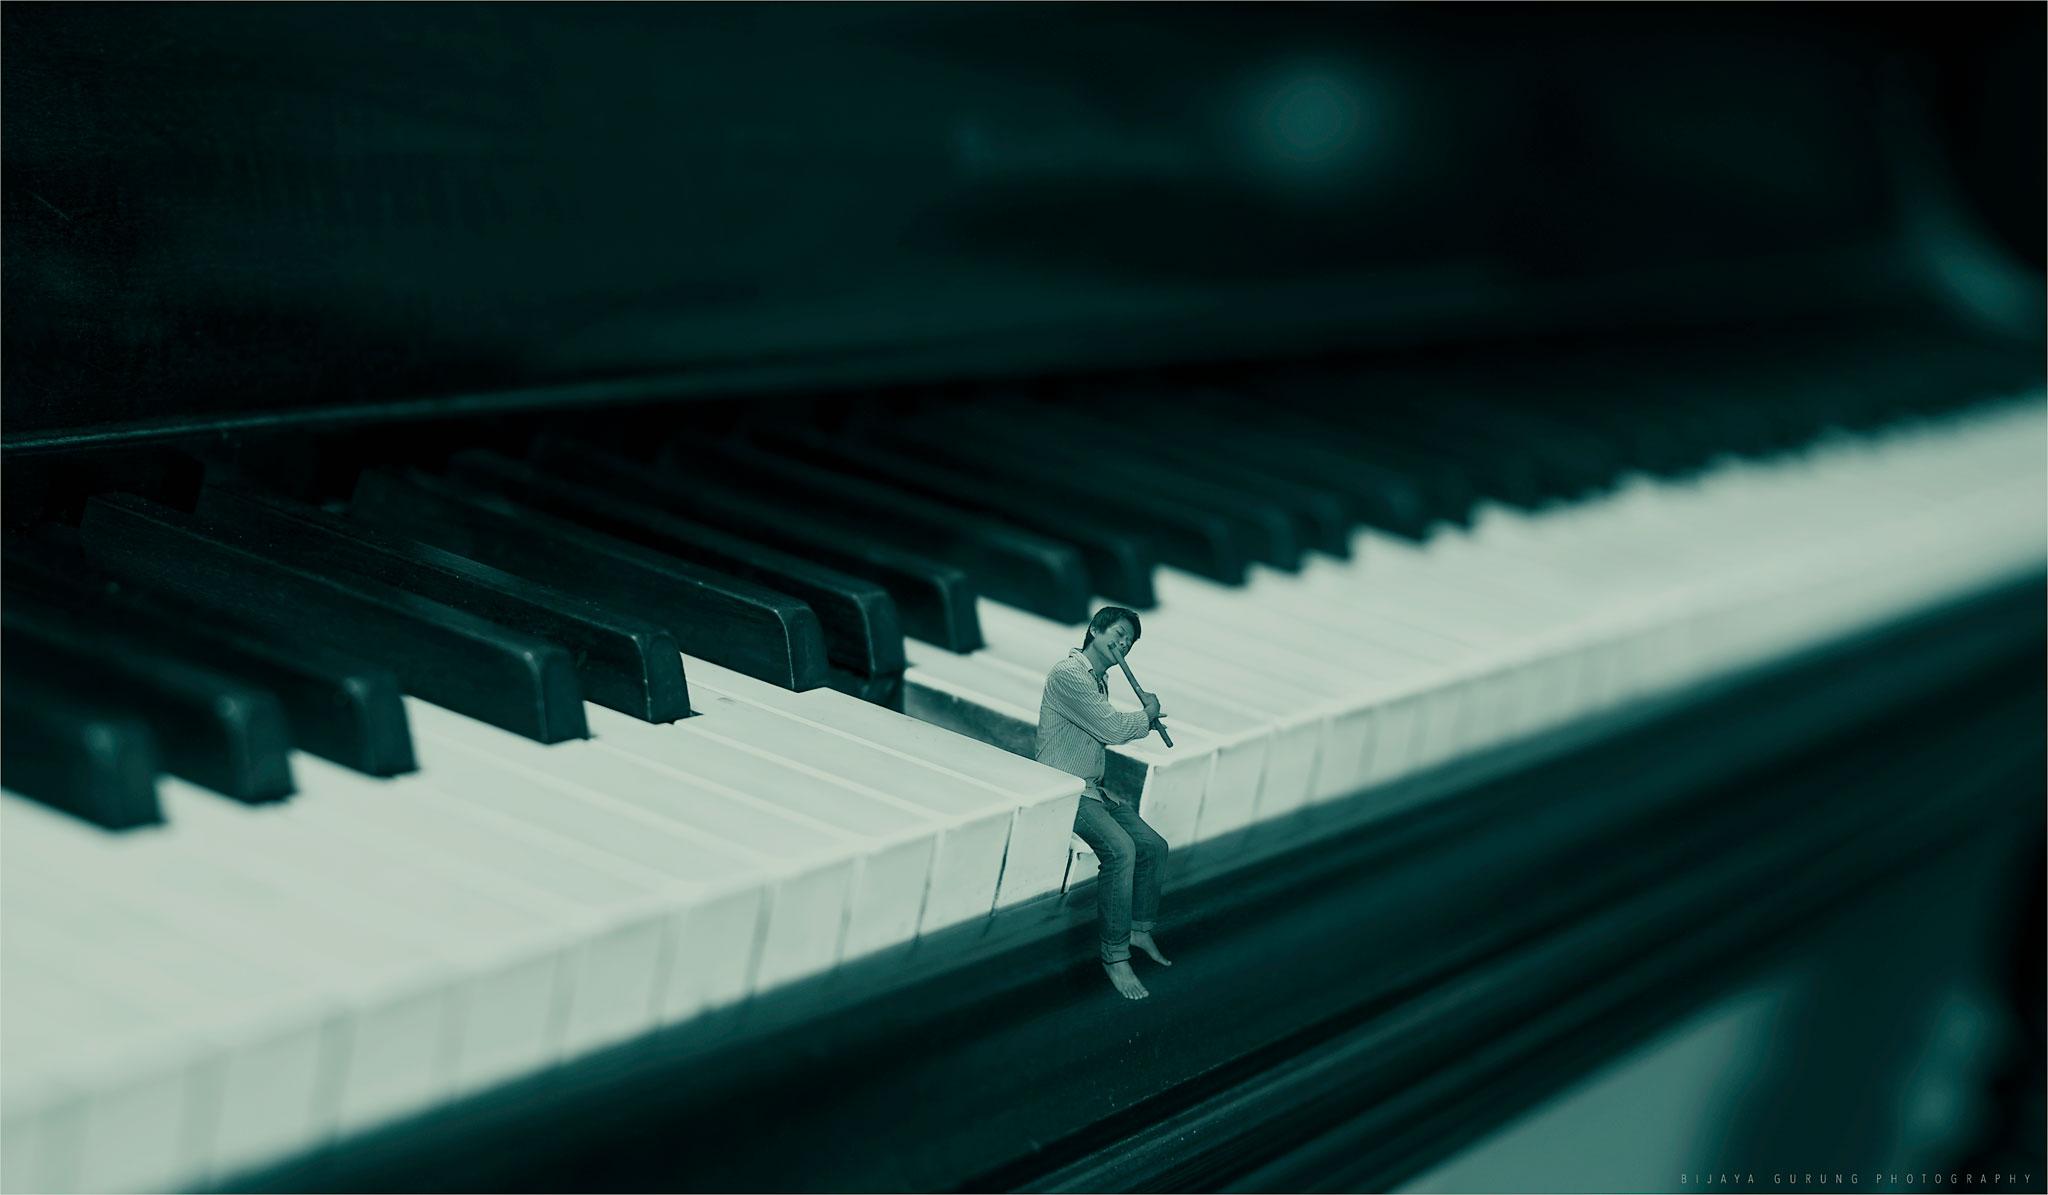 Wallpaper Music Photoshop Miniature Keyboard Piano Flute Canon6d Photomannipulation 2048x1195 937814 Hd Wallpapers Wallhere